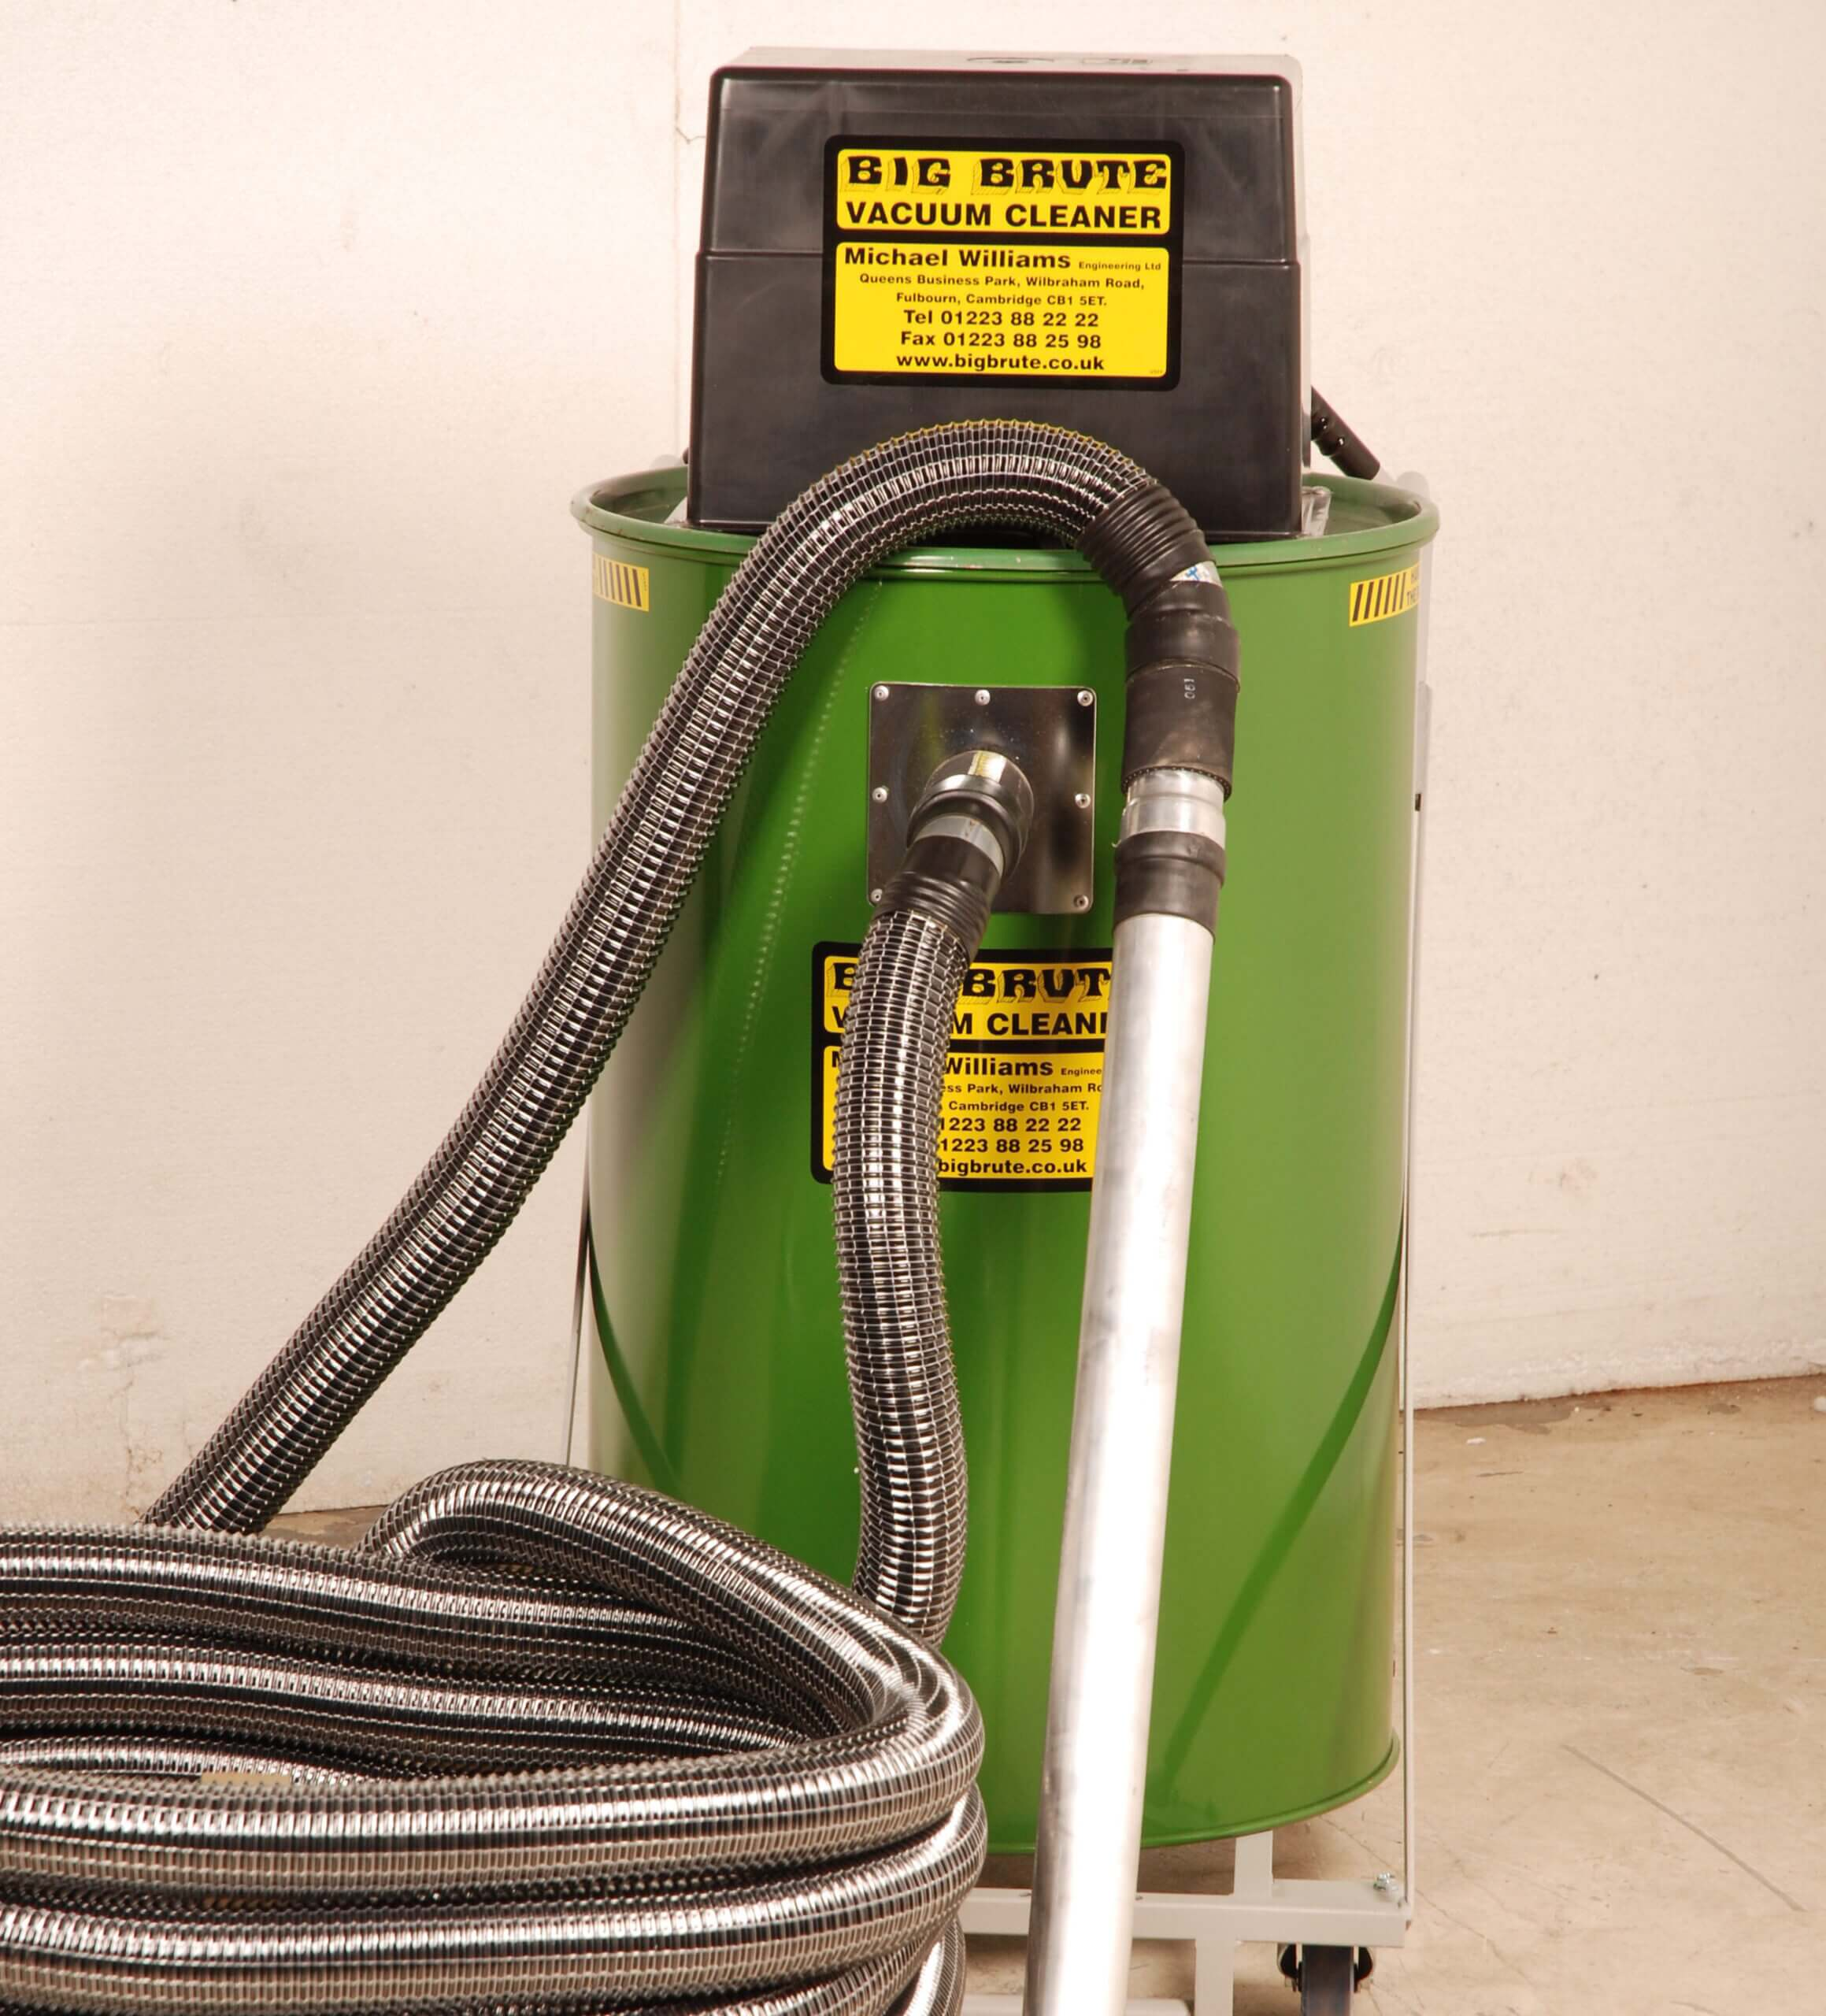 Big Brute Popular Industrial Vacuum Cleaner With Long Hose